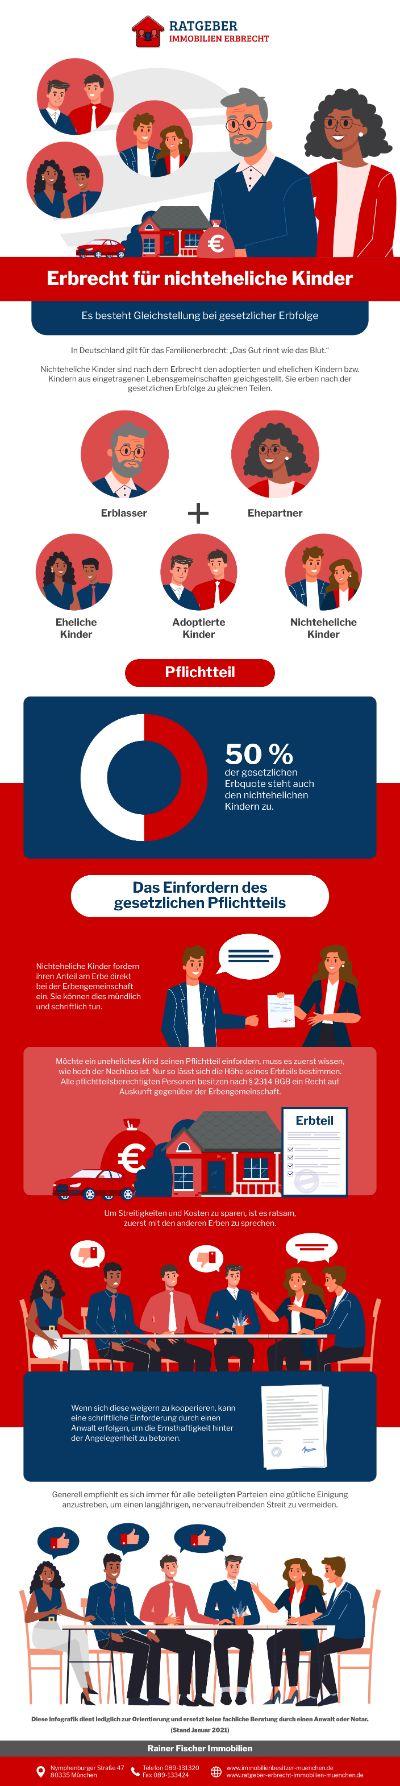 Ratgeber Erbrecht Infografik - Erbrecht: Was Erben Nichteheliche Kinder?